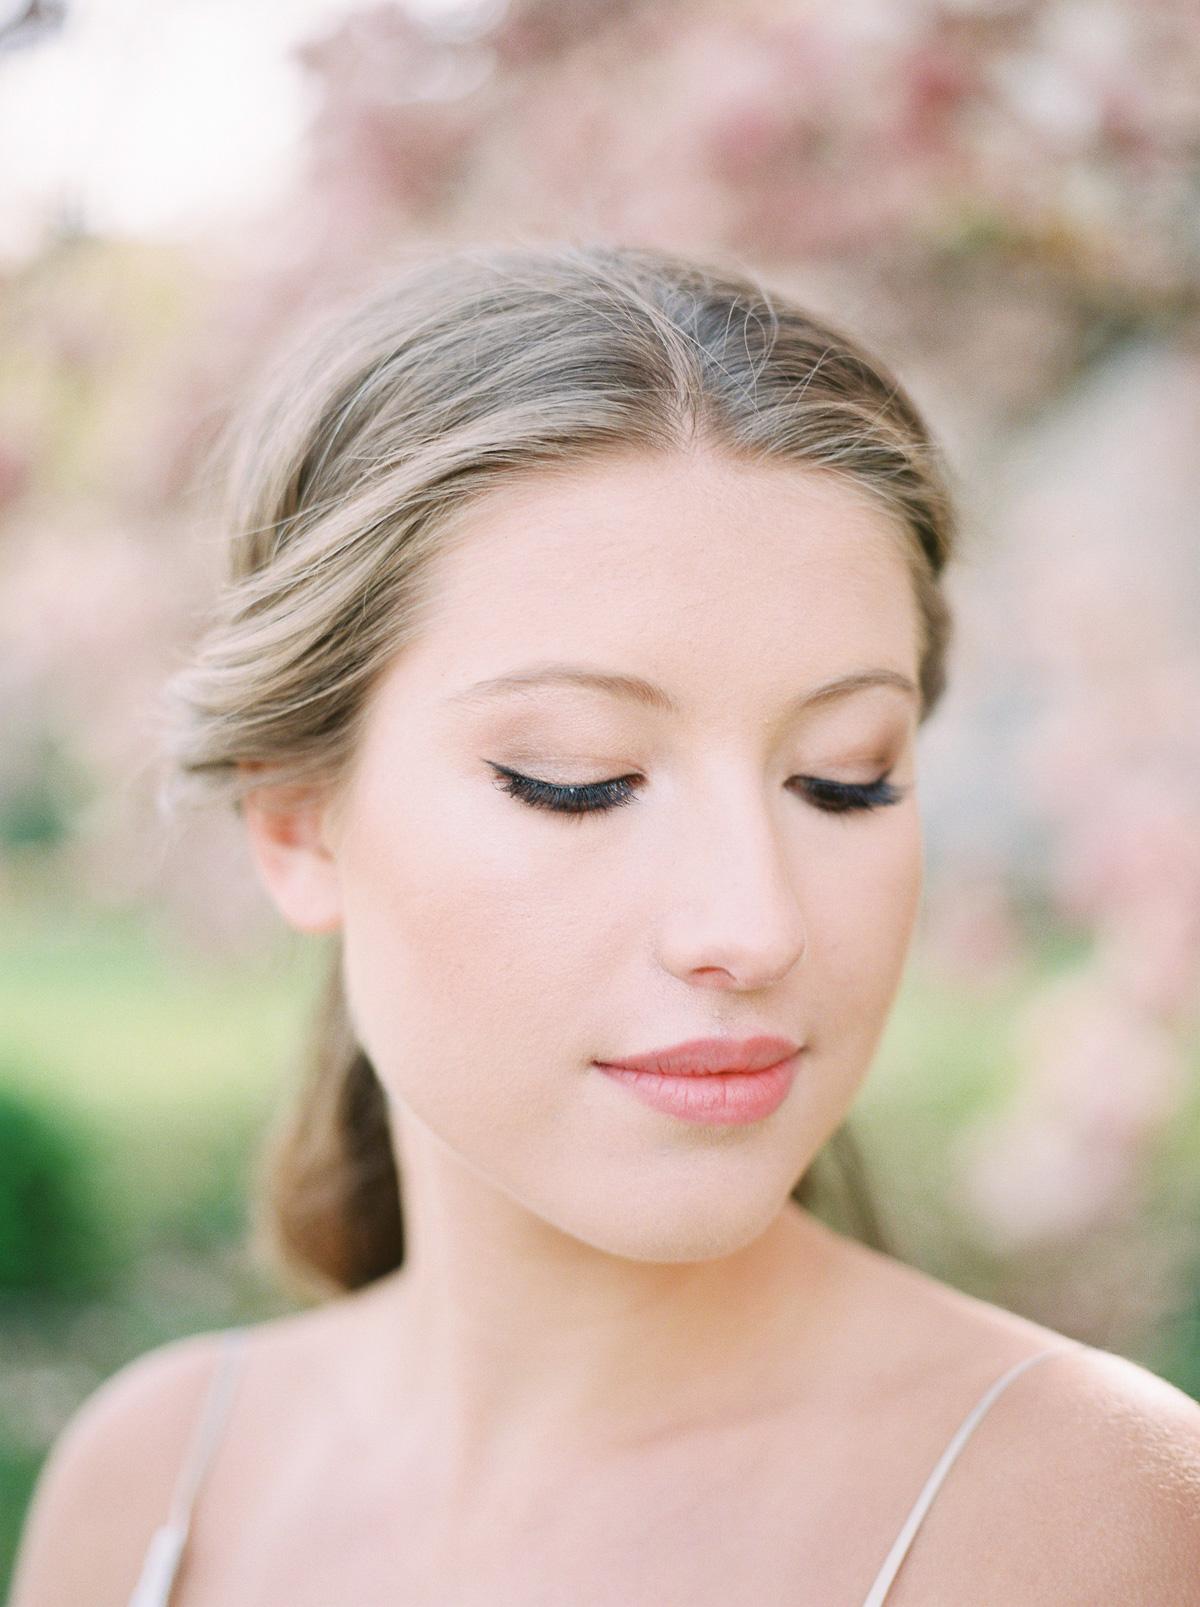 julia-park-photography-vineyard-bride-swish-list-niagara-on-the-lake-wedding-editorial-10.jpg